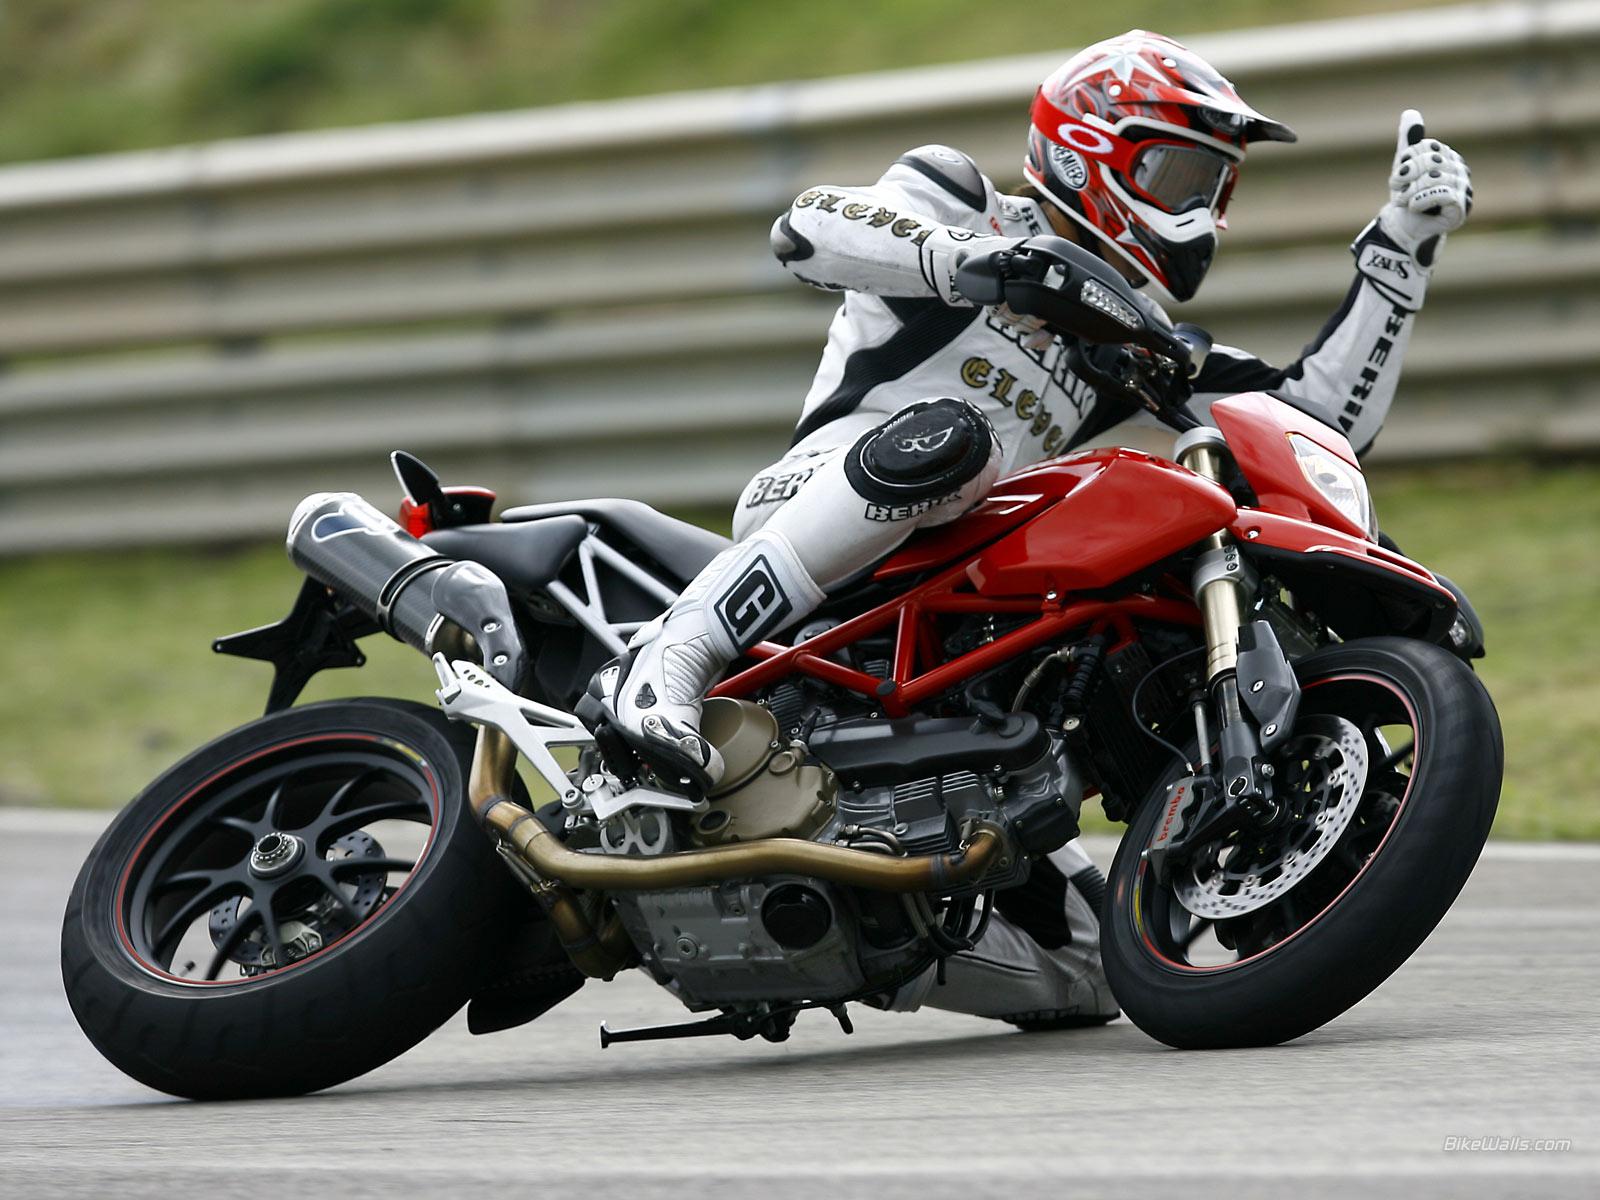 Ruben Xaus Ducati Hypermotard